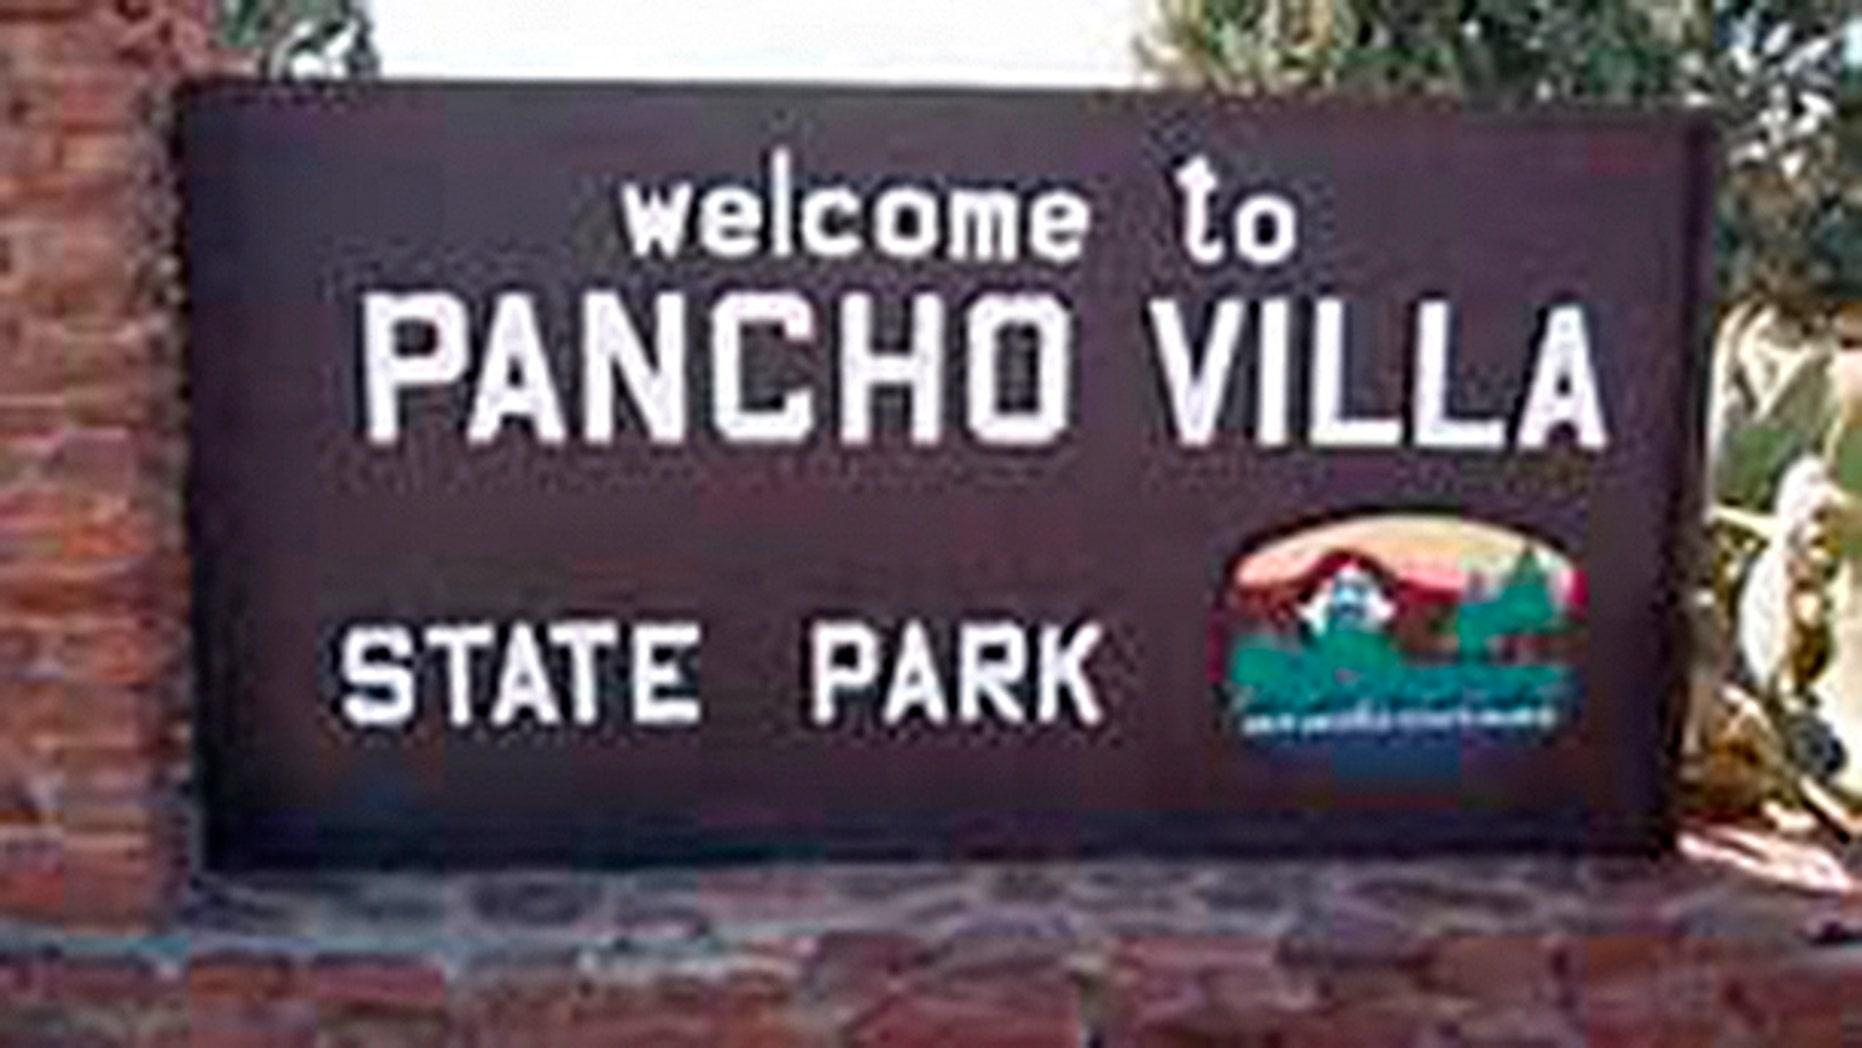 Pancho Villa State Park in Columbus, N.M.